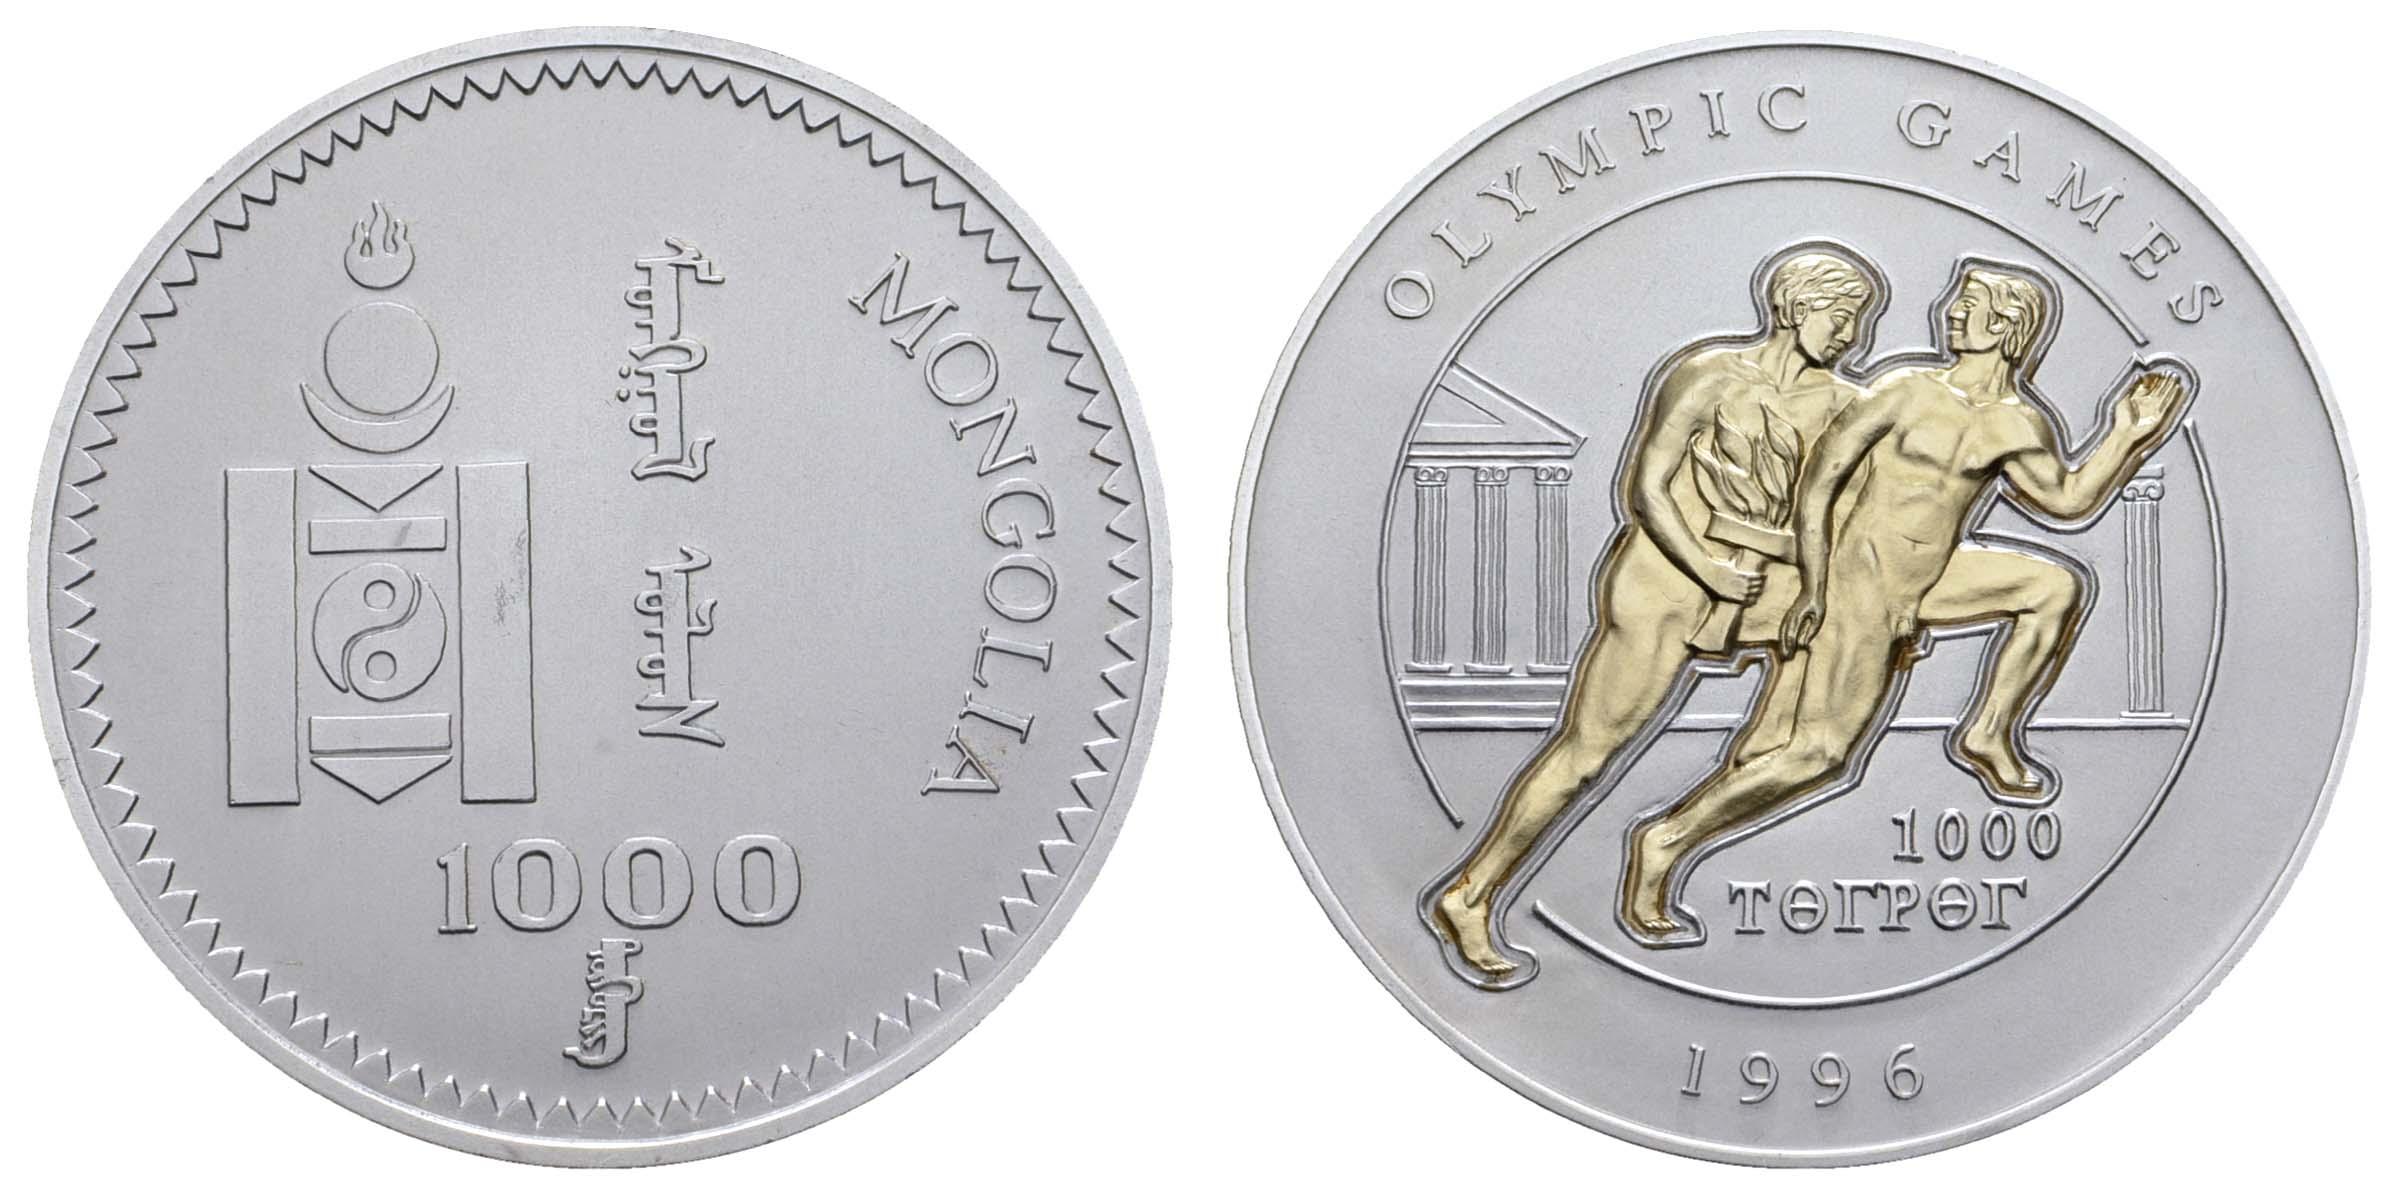 Lot 2073 - übersee mongolei -  Auktionshaus Ulrich Felzmann GmbH & Co. KG Coins single lots